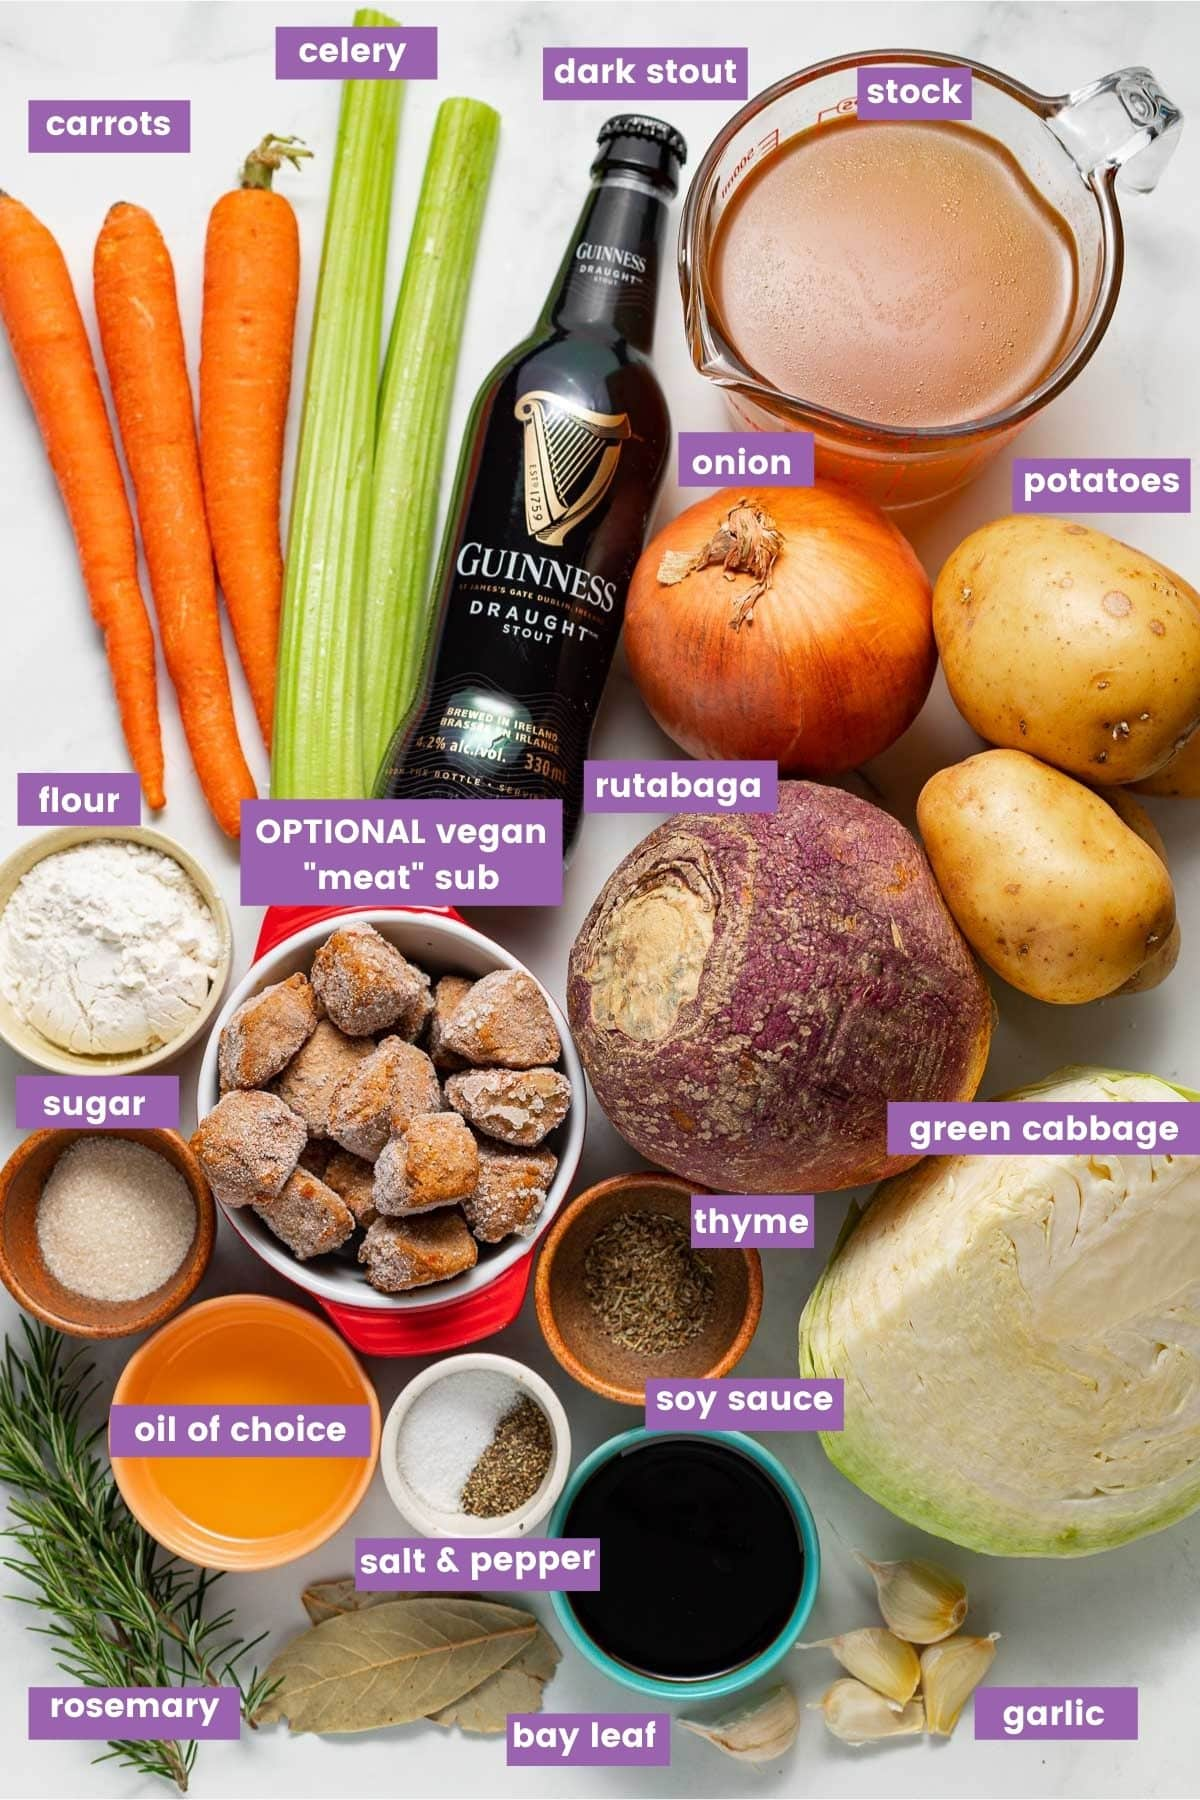 ingredients for or vegan Irish stew as per the written ingredient list